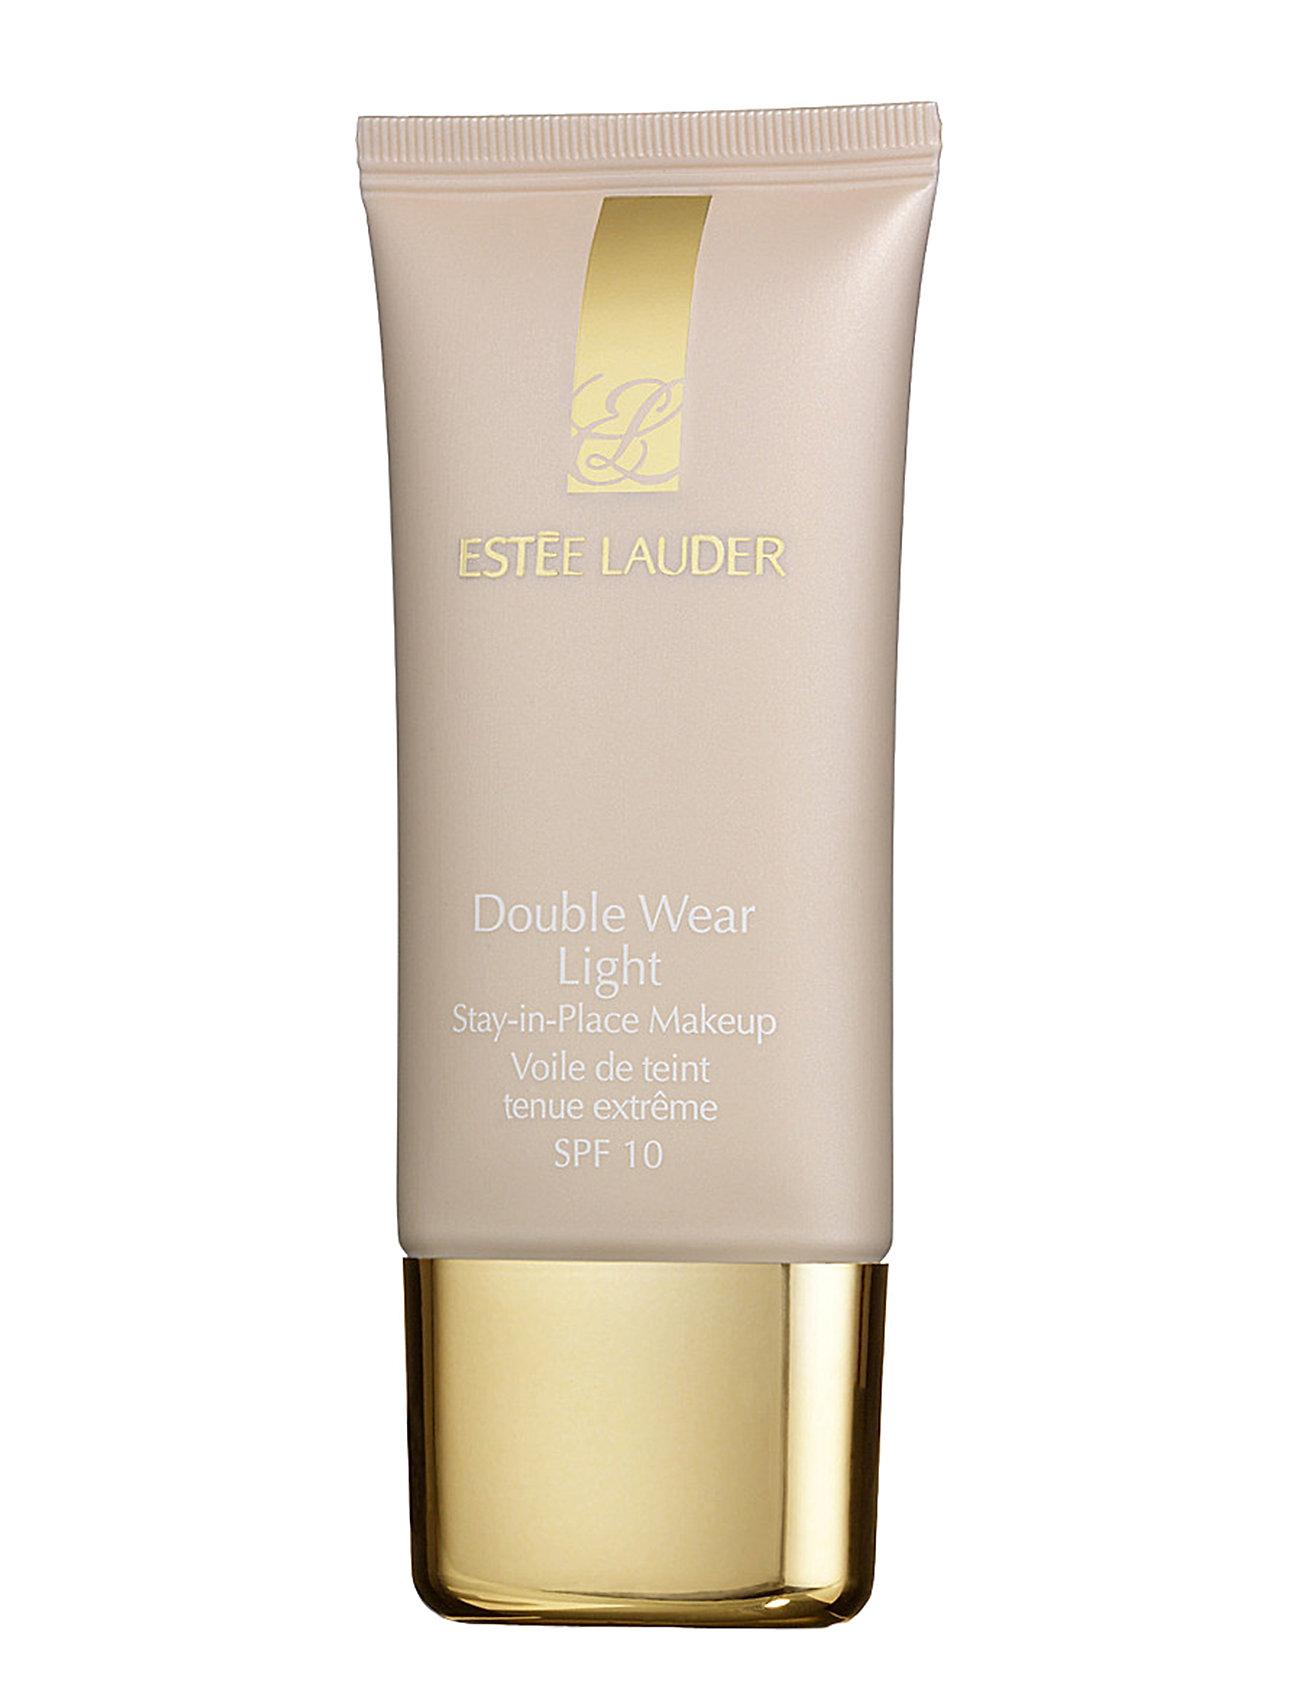 Double Wear Light Stay-In-Place Makeup - Intensity EstÈe Lauder  til Damer i